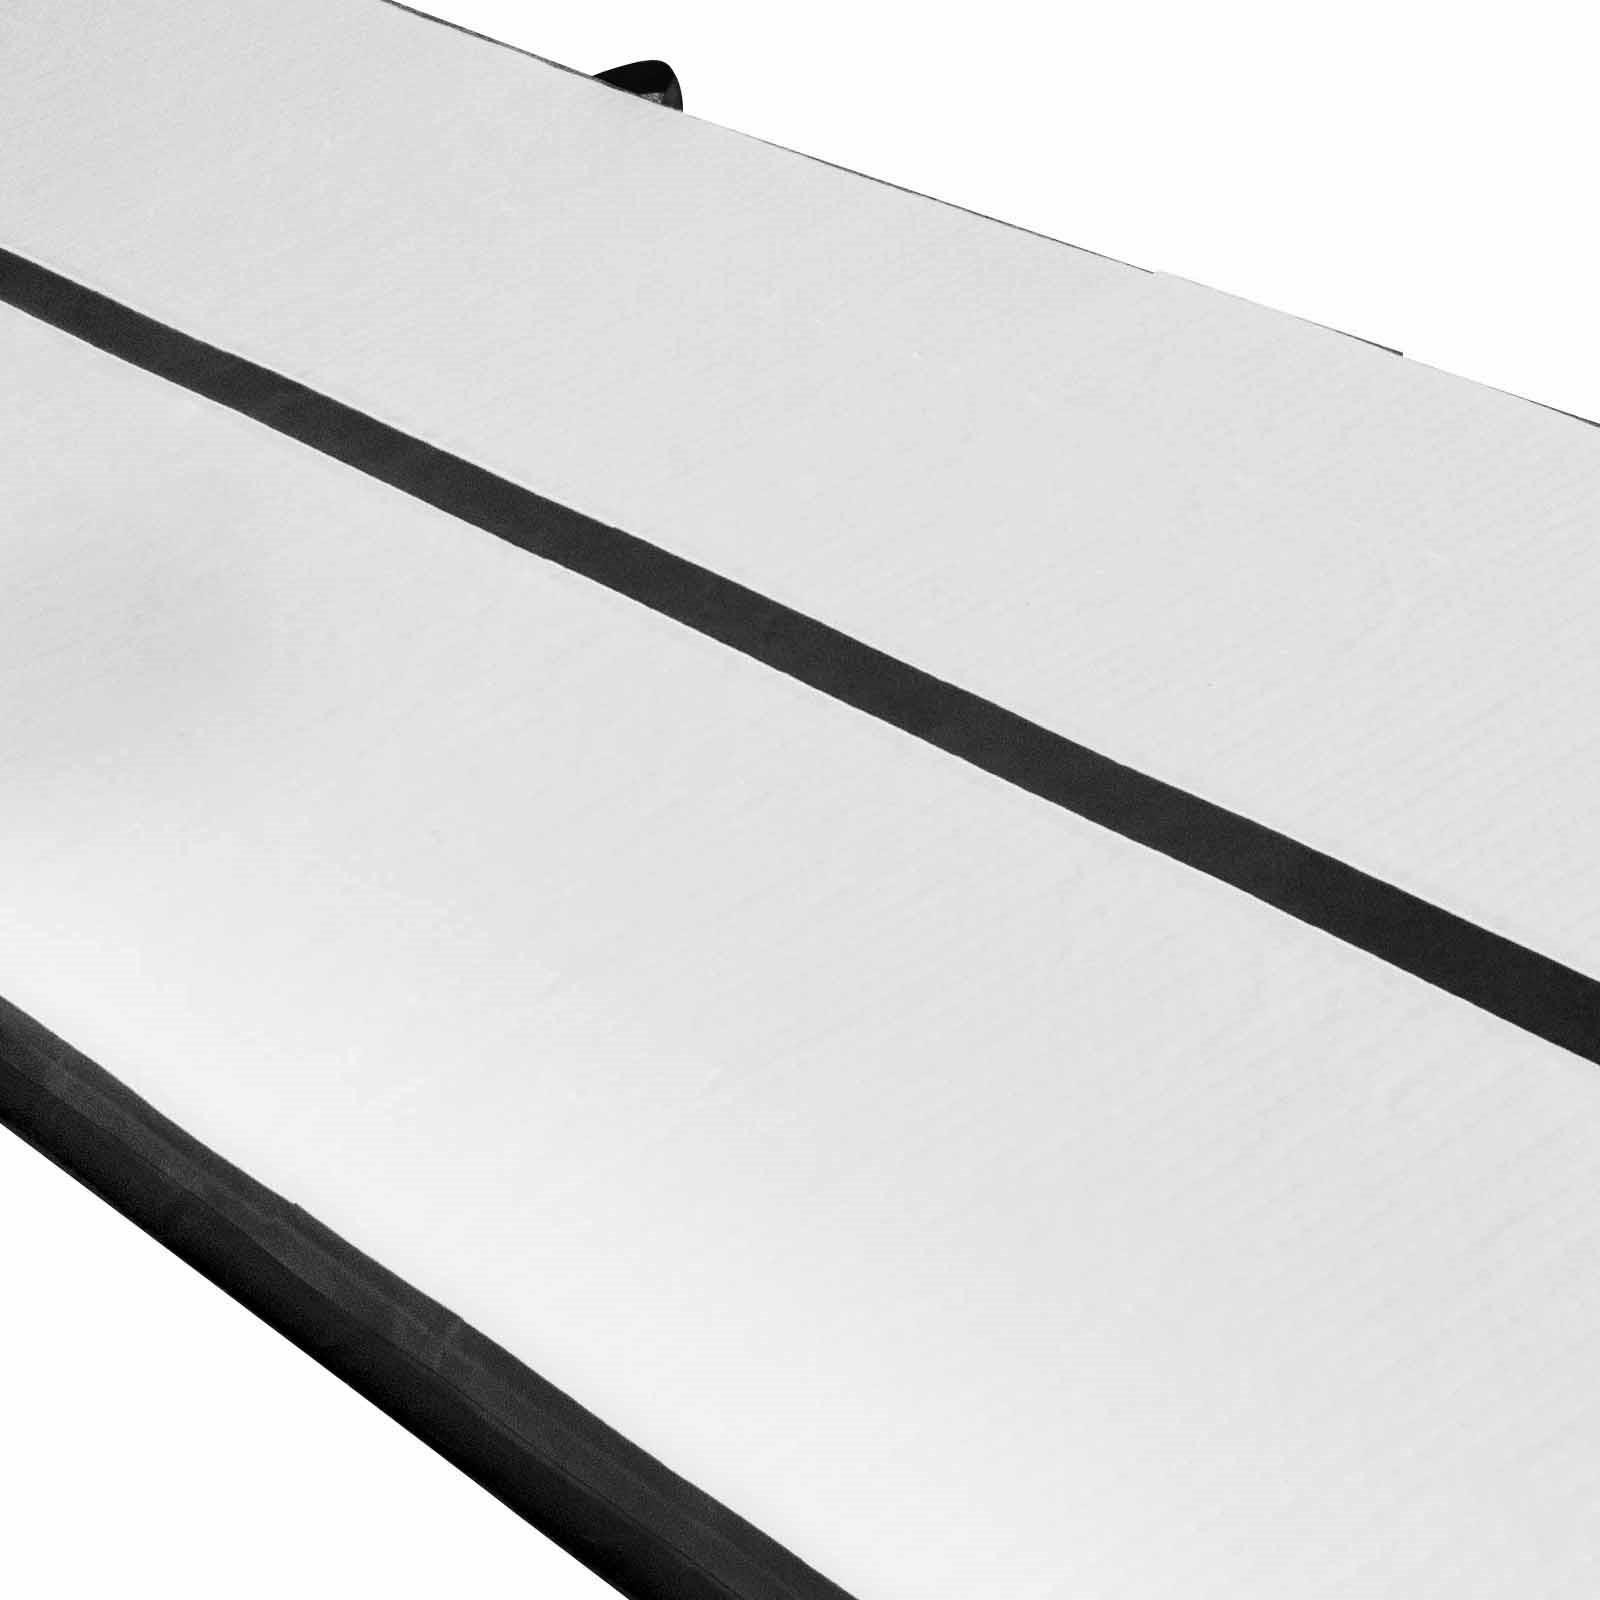 Air-Track-10x3FT-Trumbling-Airtrack-Gymnastics-Yoga-Floor-Mat-Training-Pad-Home thumbnail 55